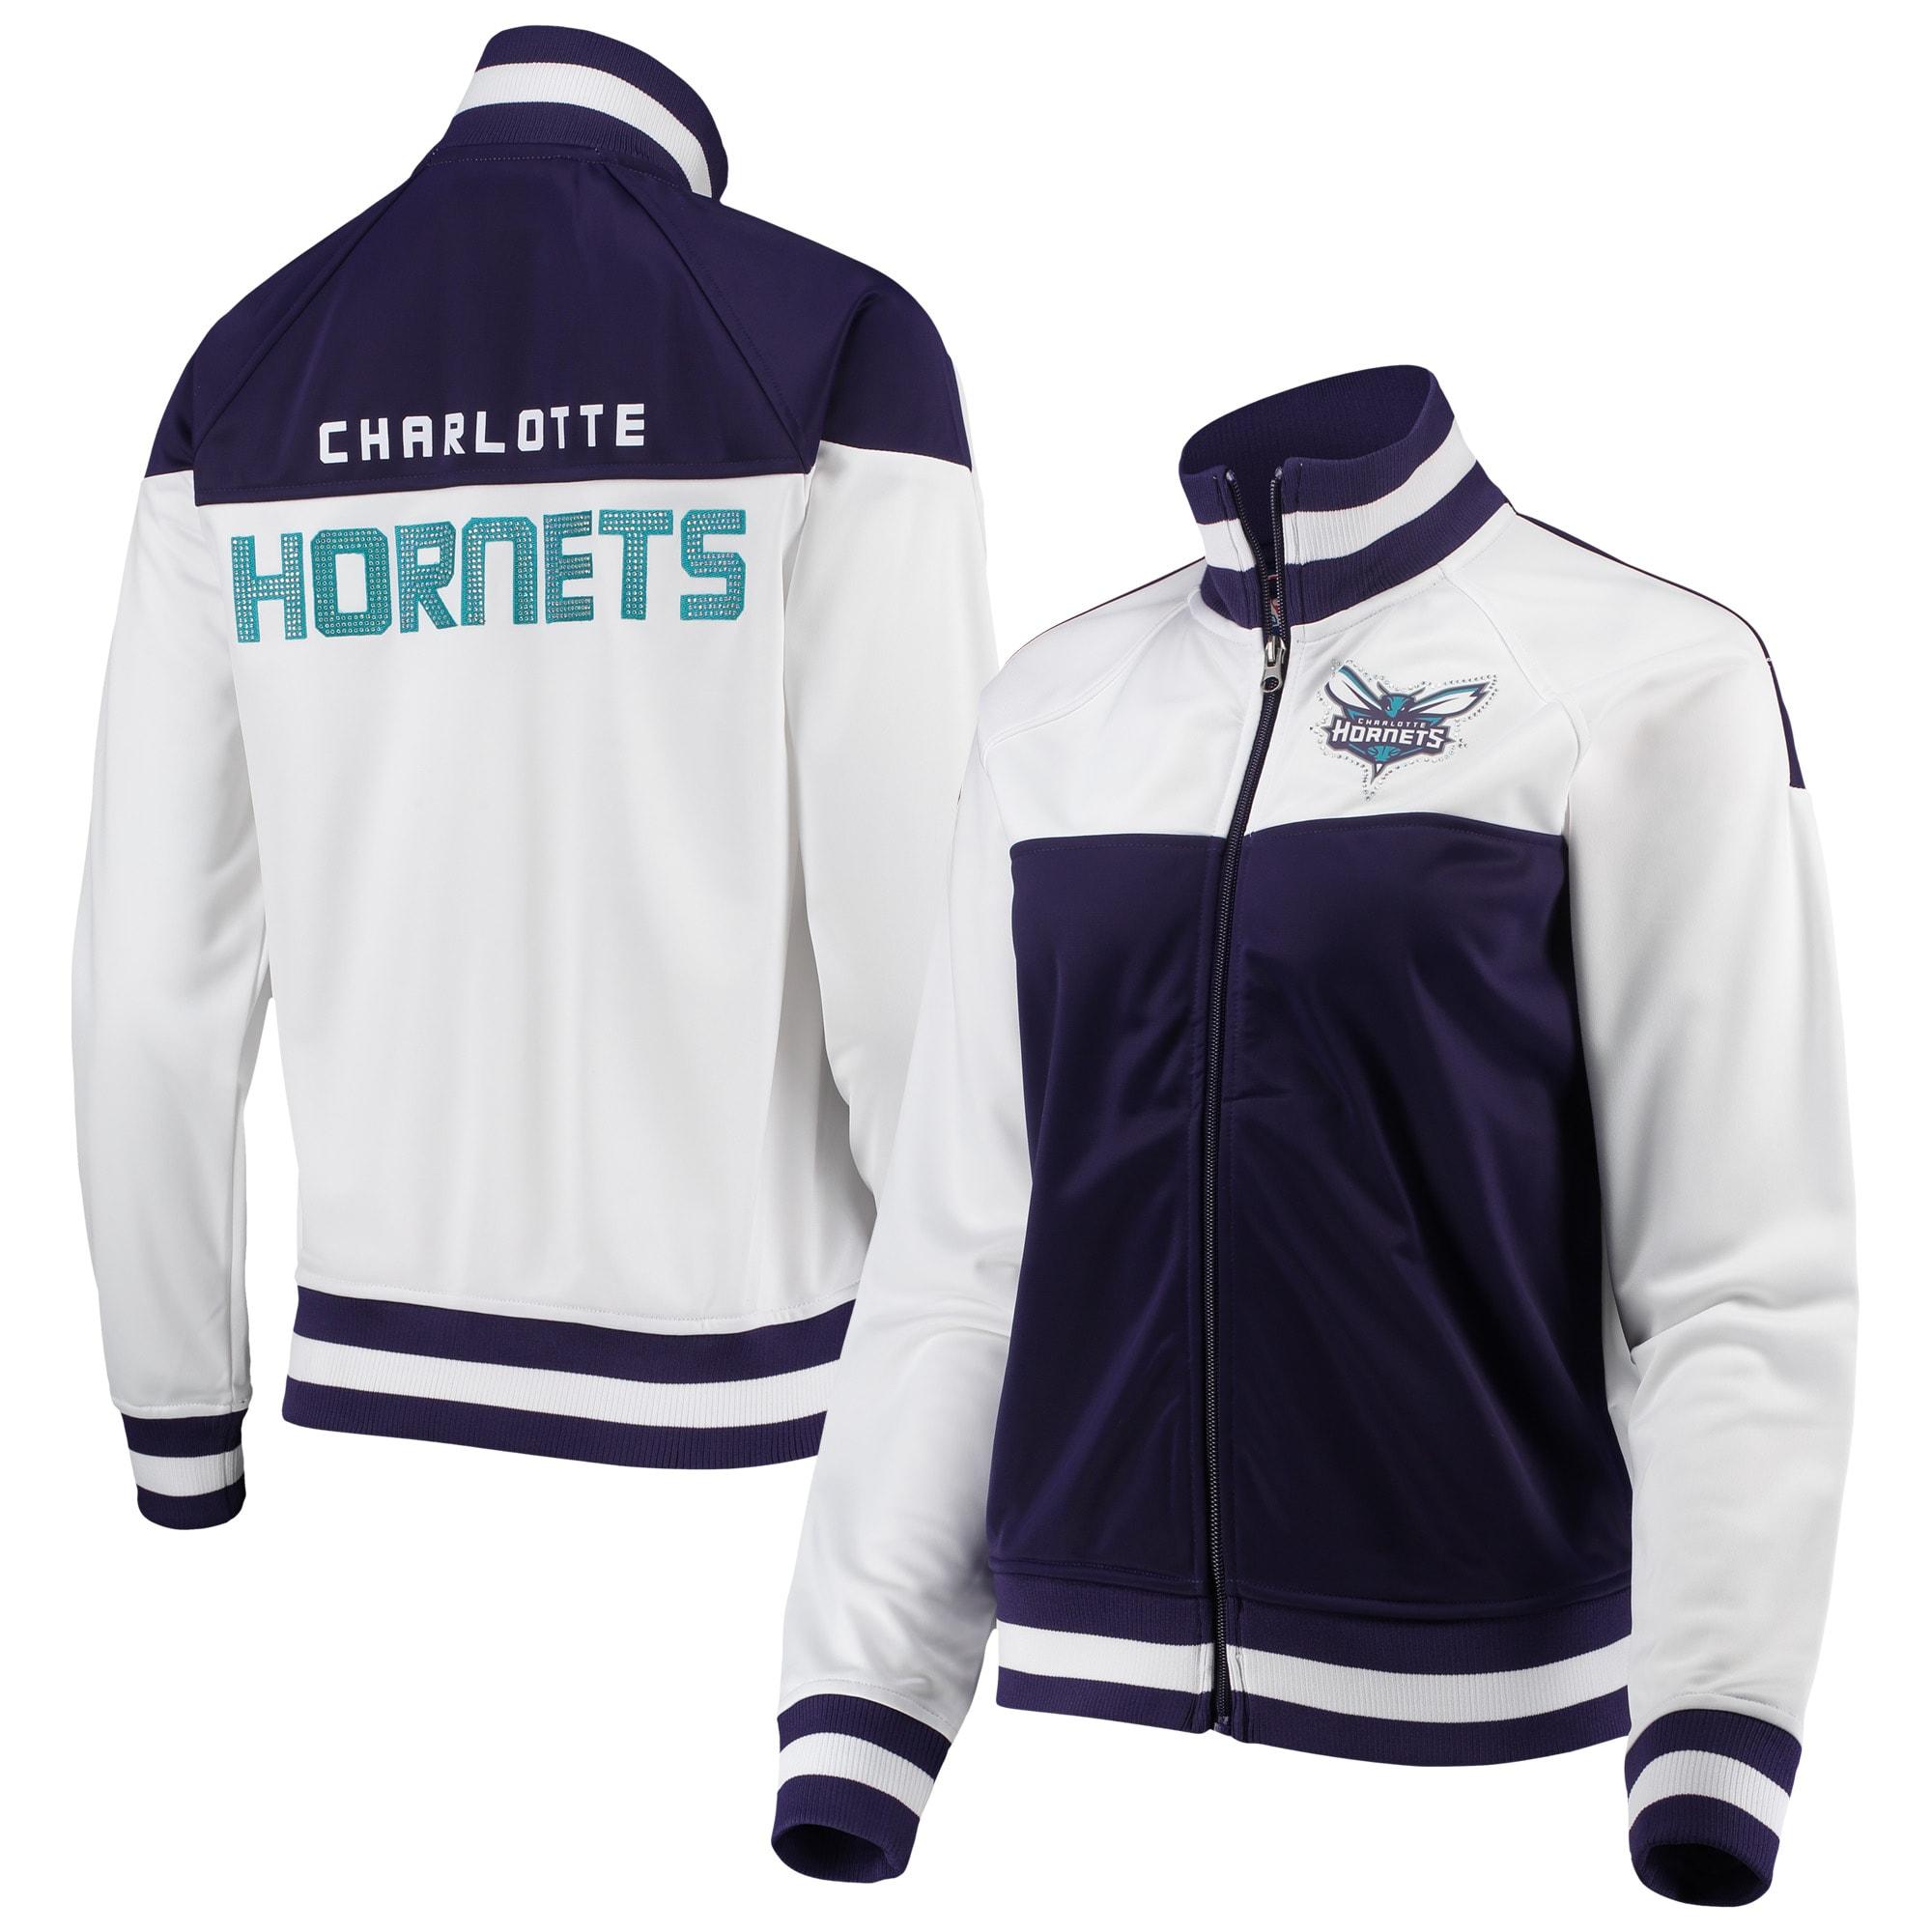 Charlotte Hornets G-III 4Her by Carl Banks Women's Tip-Off Rhinestone Tricot Full-Zip Track Jacket - White/Purple